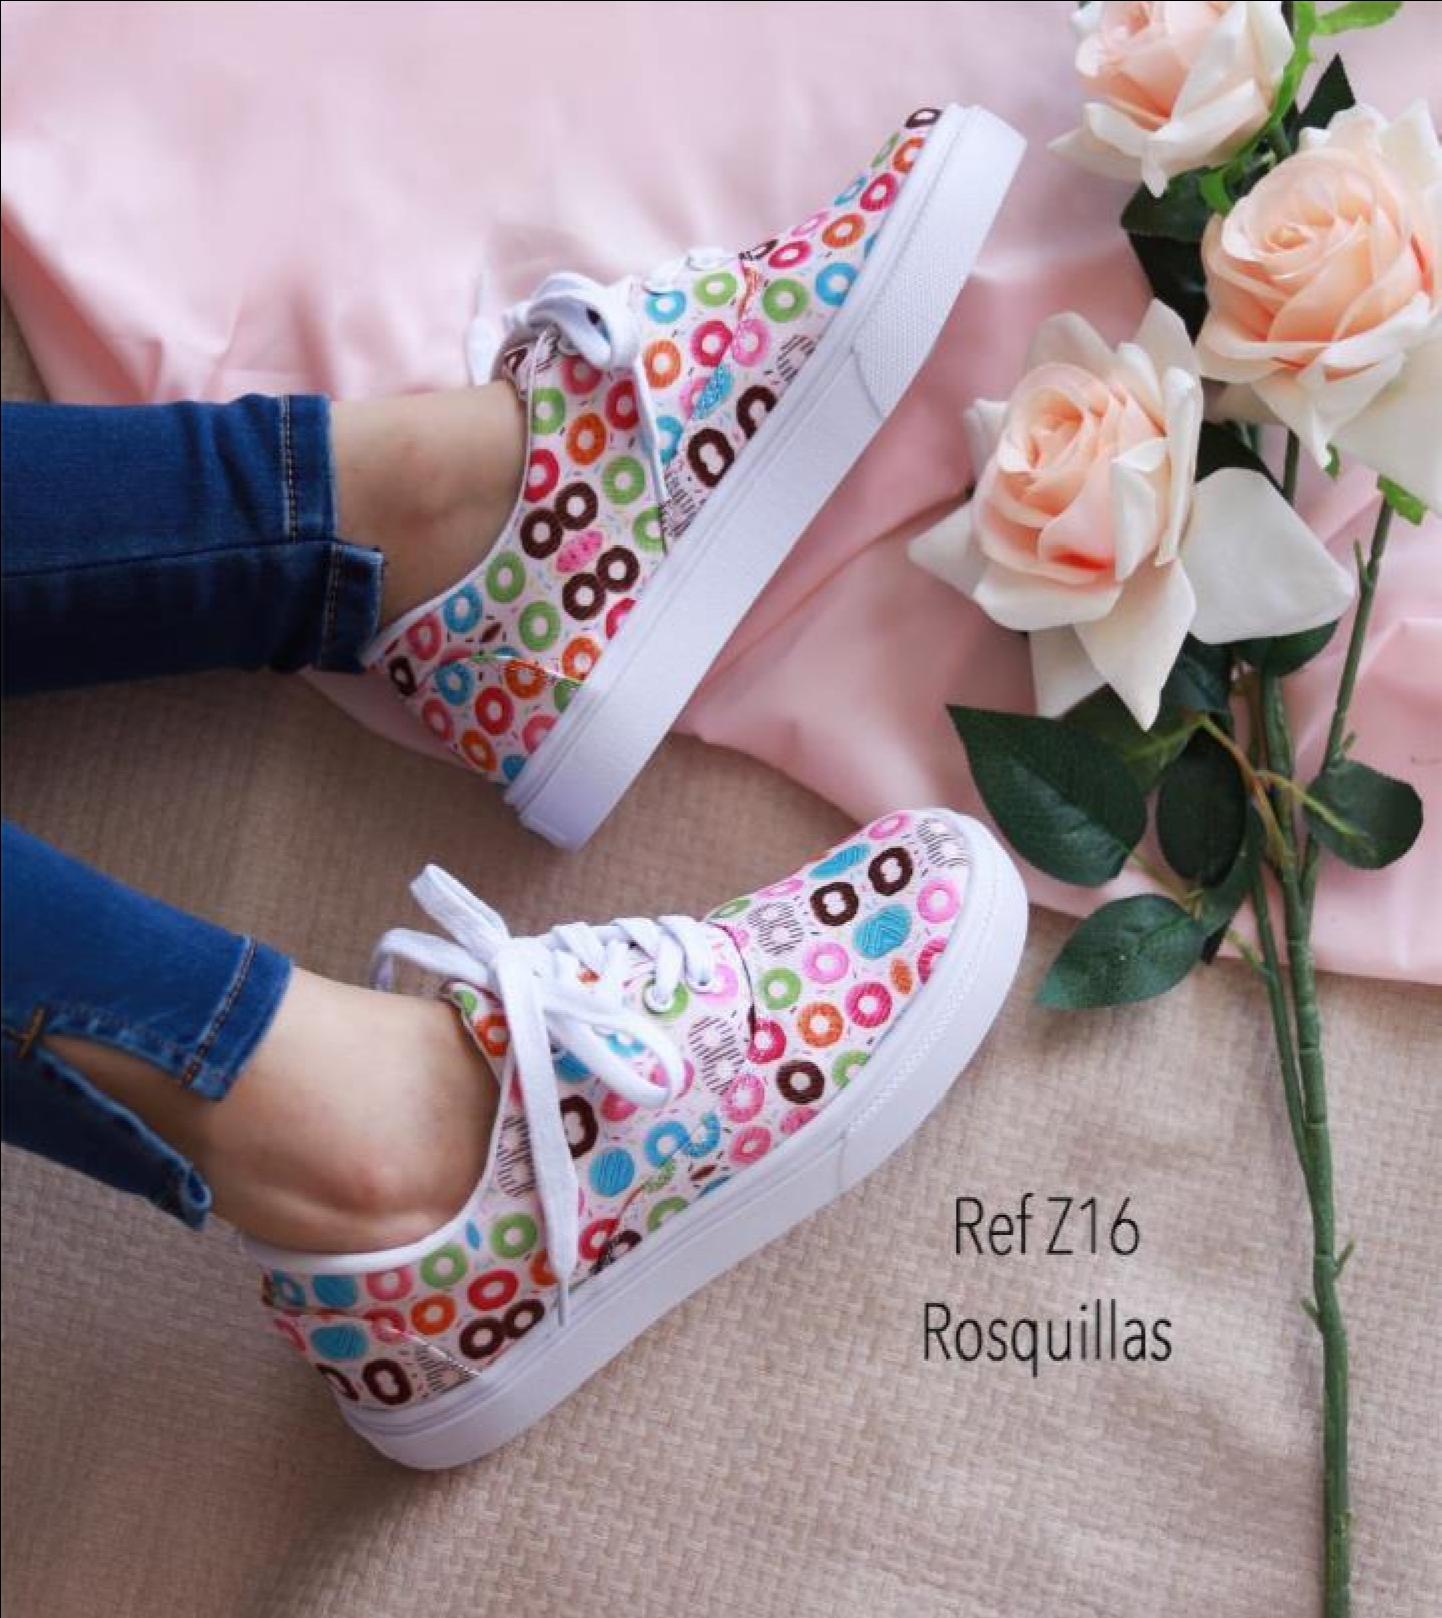 Refz-16 Rosquillas